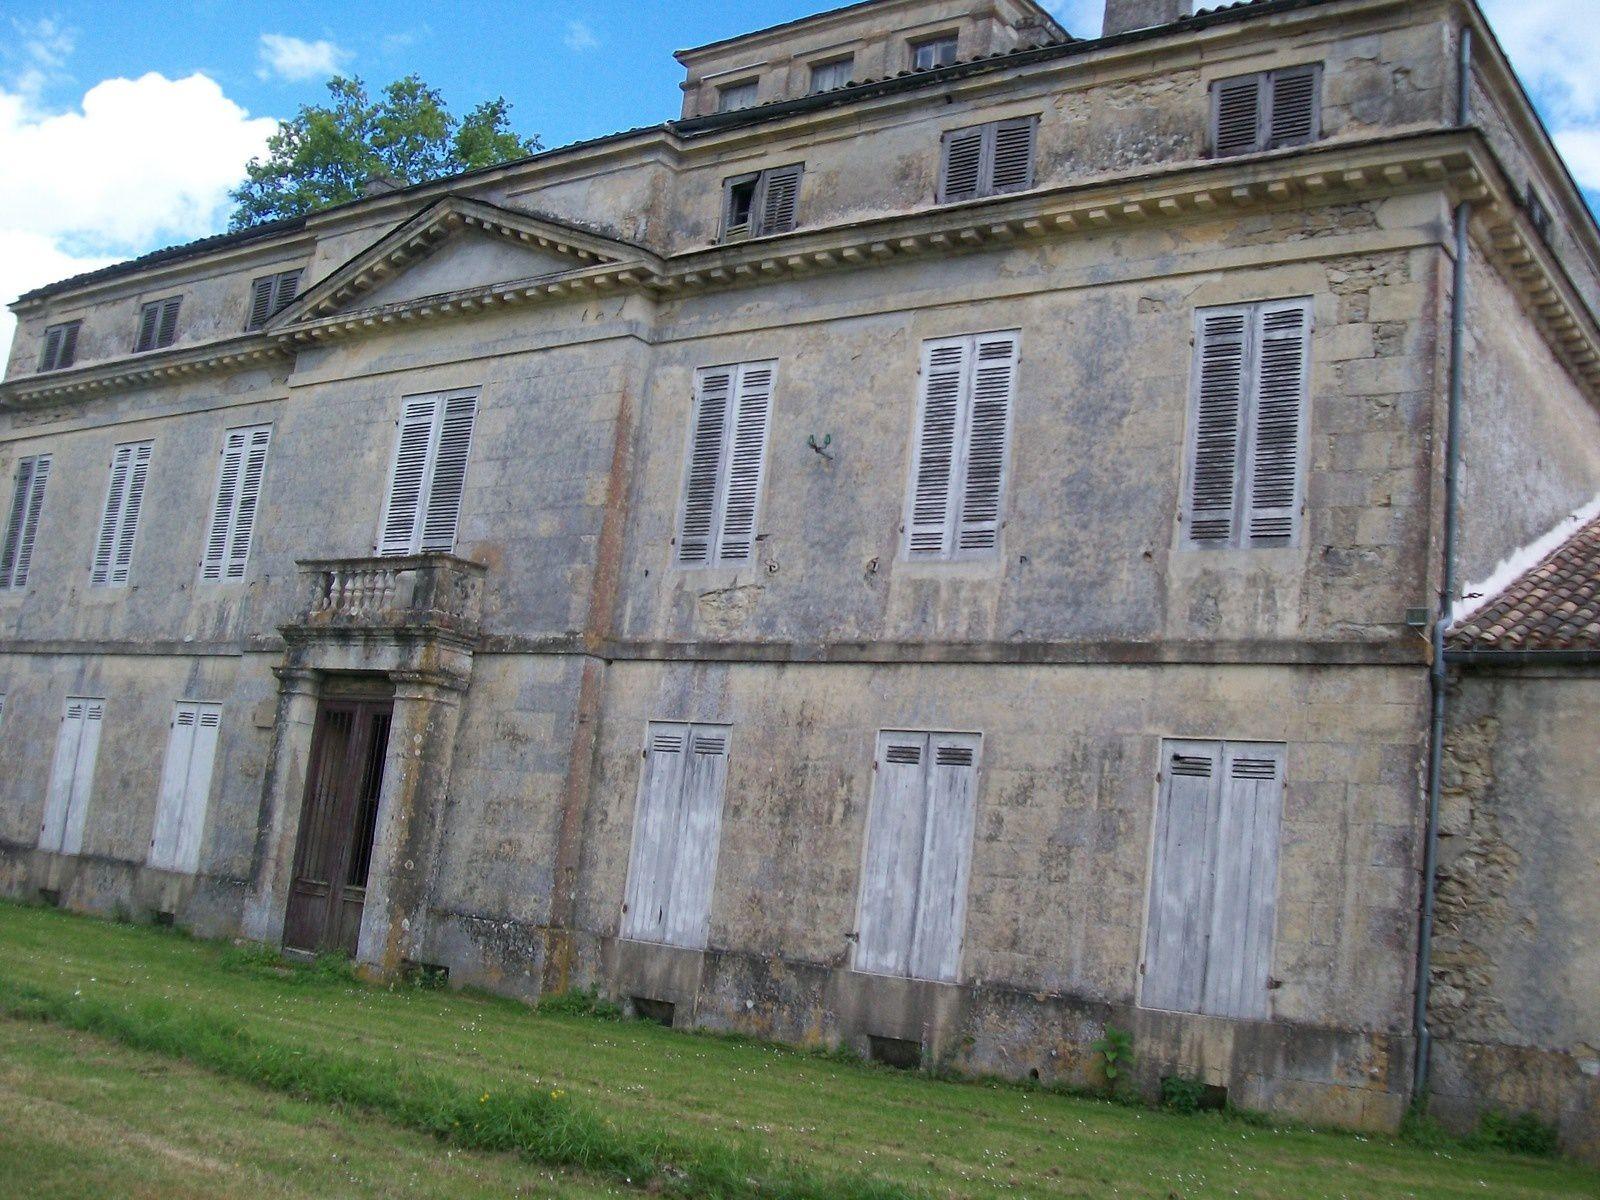 Samedi 30 mai 2015  La bastide de Sauveterre de Guyenne  &amp&#x3B; le Castel de Pommiers